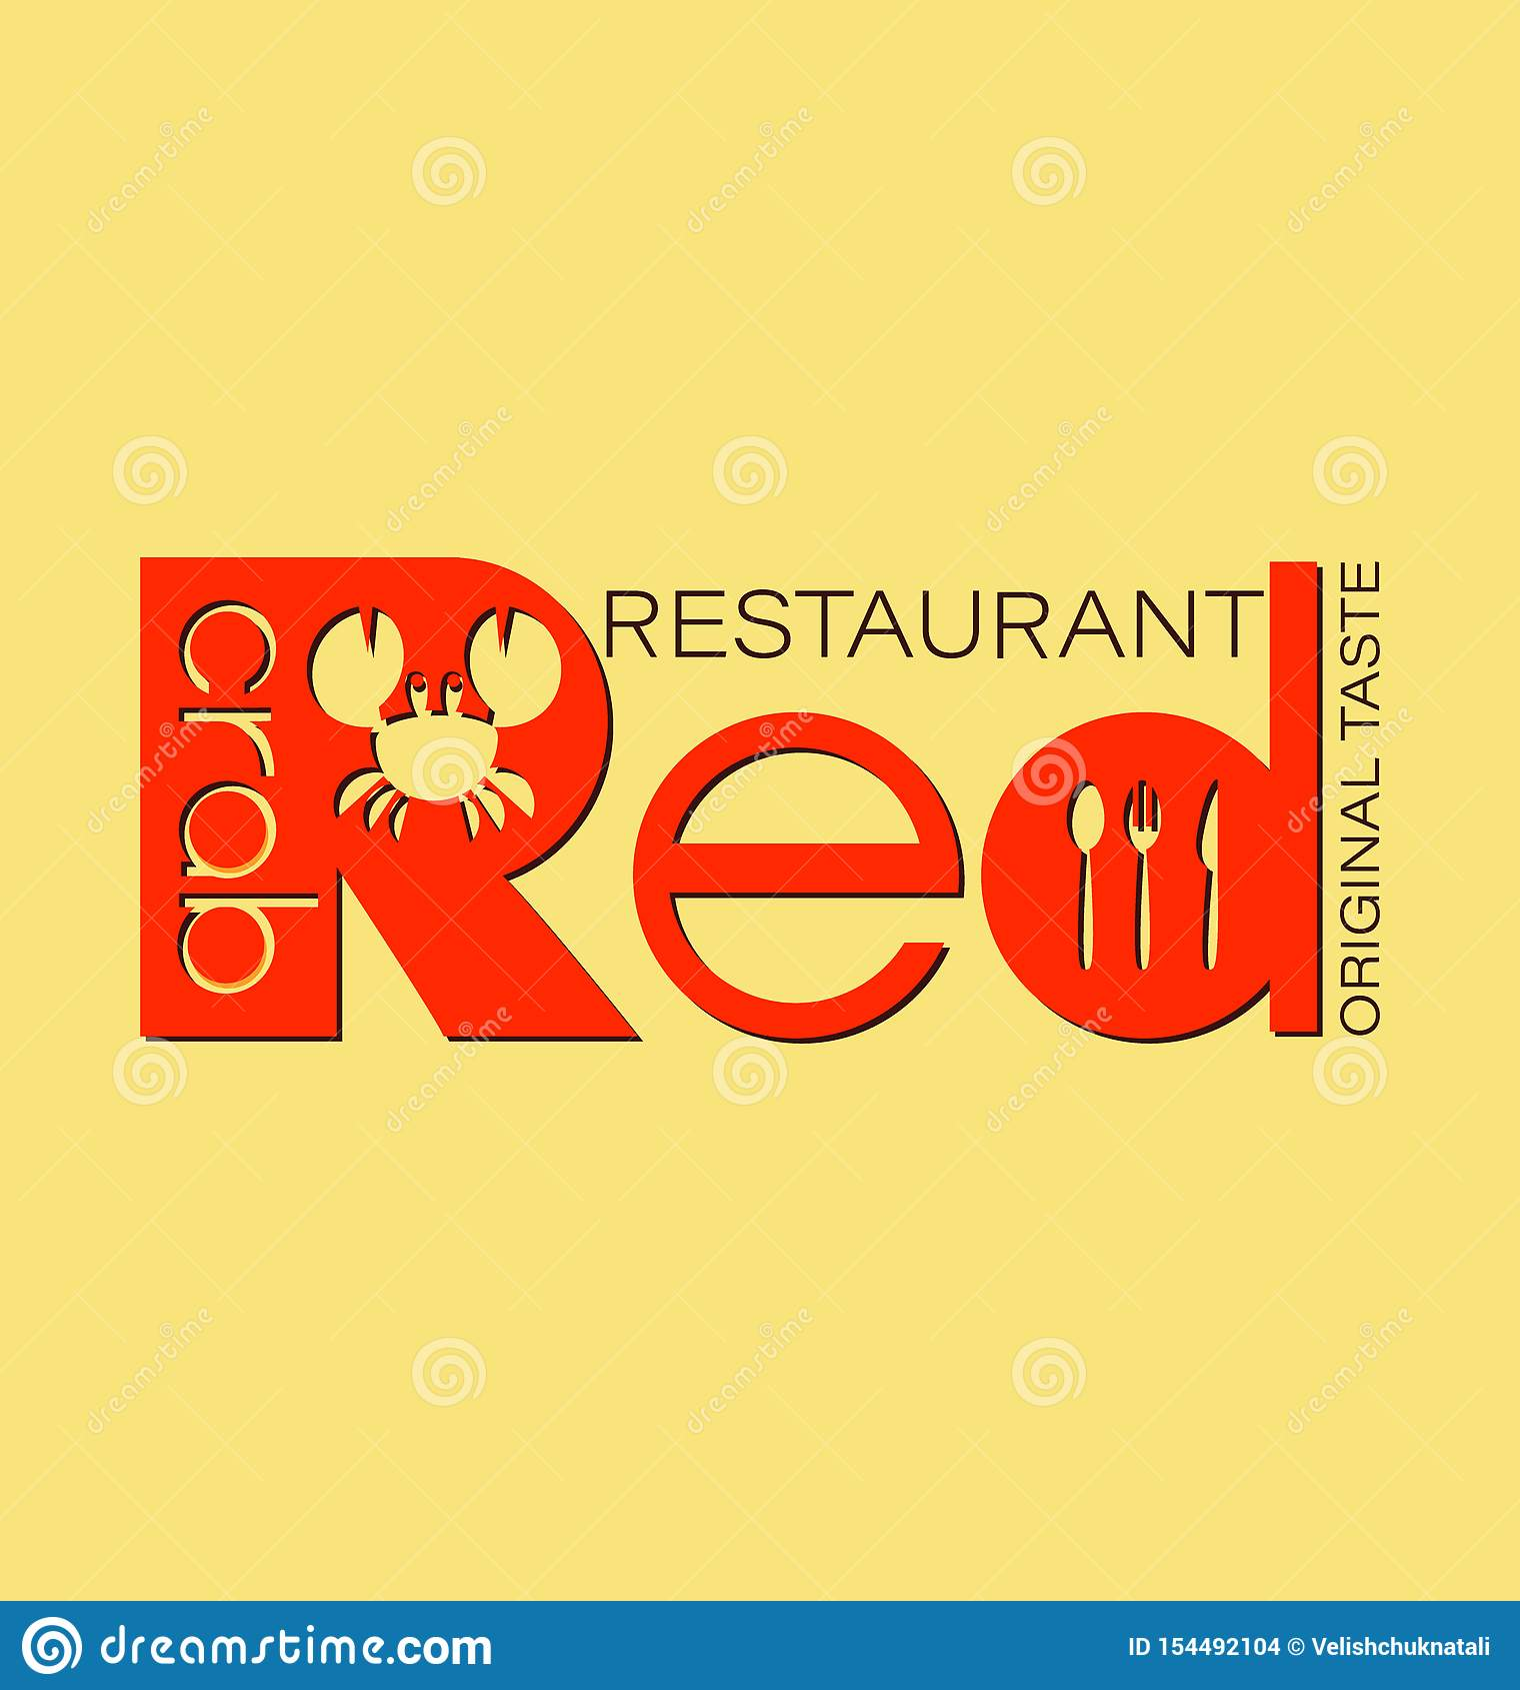 Restaurant Red Crab Seafood Restaurant Logo Stock Vector Illustration Of Cuisine Healthy 154492104